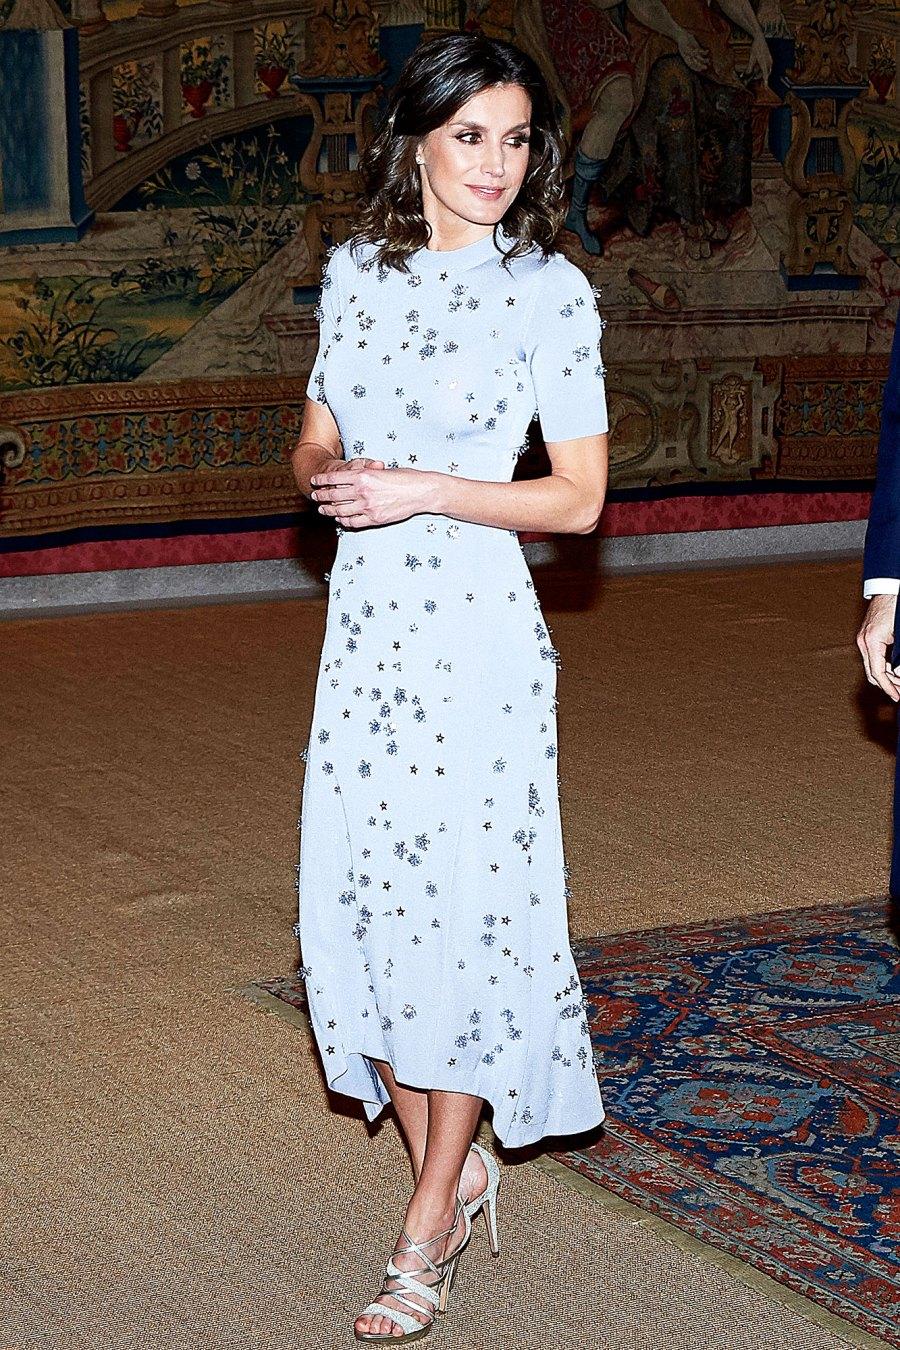 Queen Letizia of Spain Queen Letizia's Latest Dress Is a Starry Dream